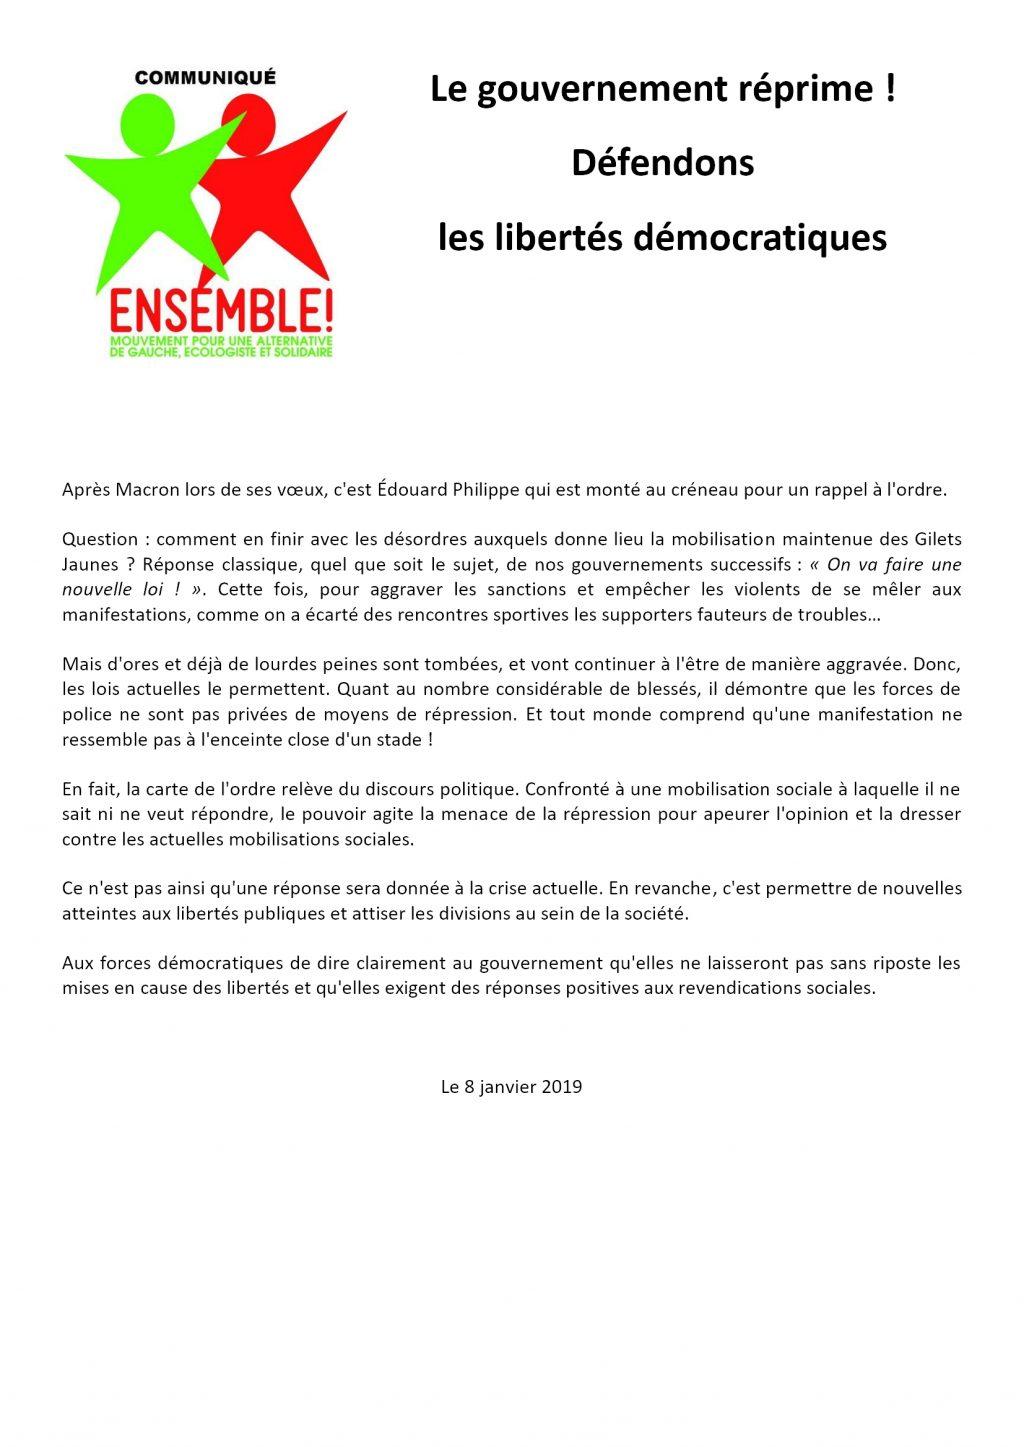 Ensemble! Com Nat 2019-01-08 Défendons les libertés démocratiques